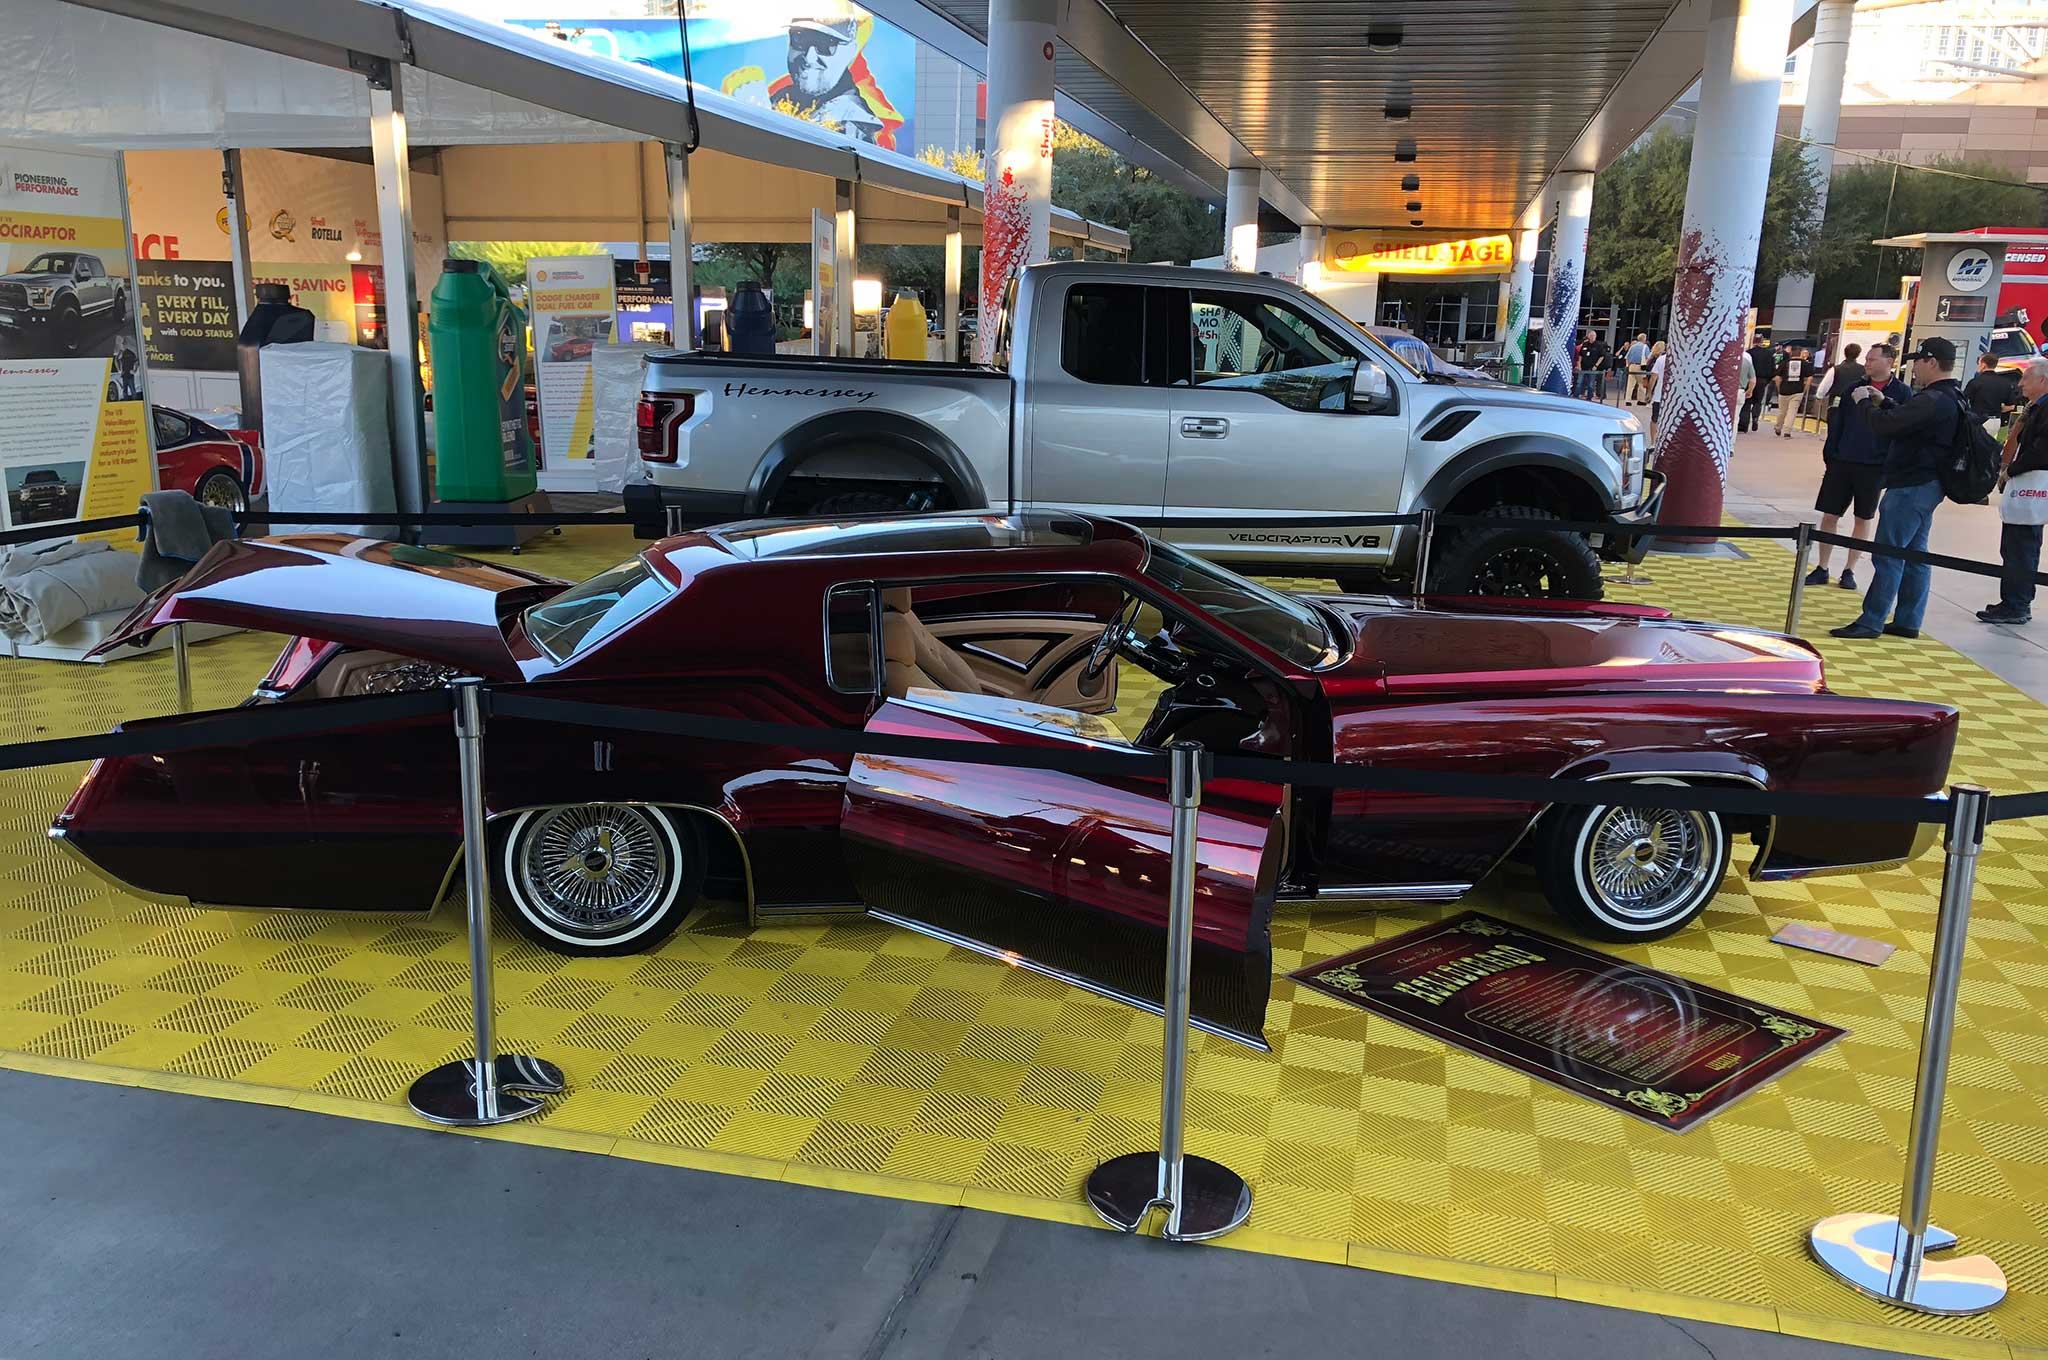 1968 cadillac eldorado driver side profile lowrider Cadillac Fleetwood Lowrider about this editor